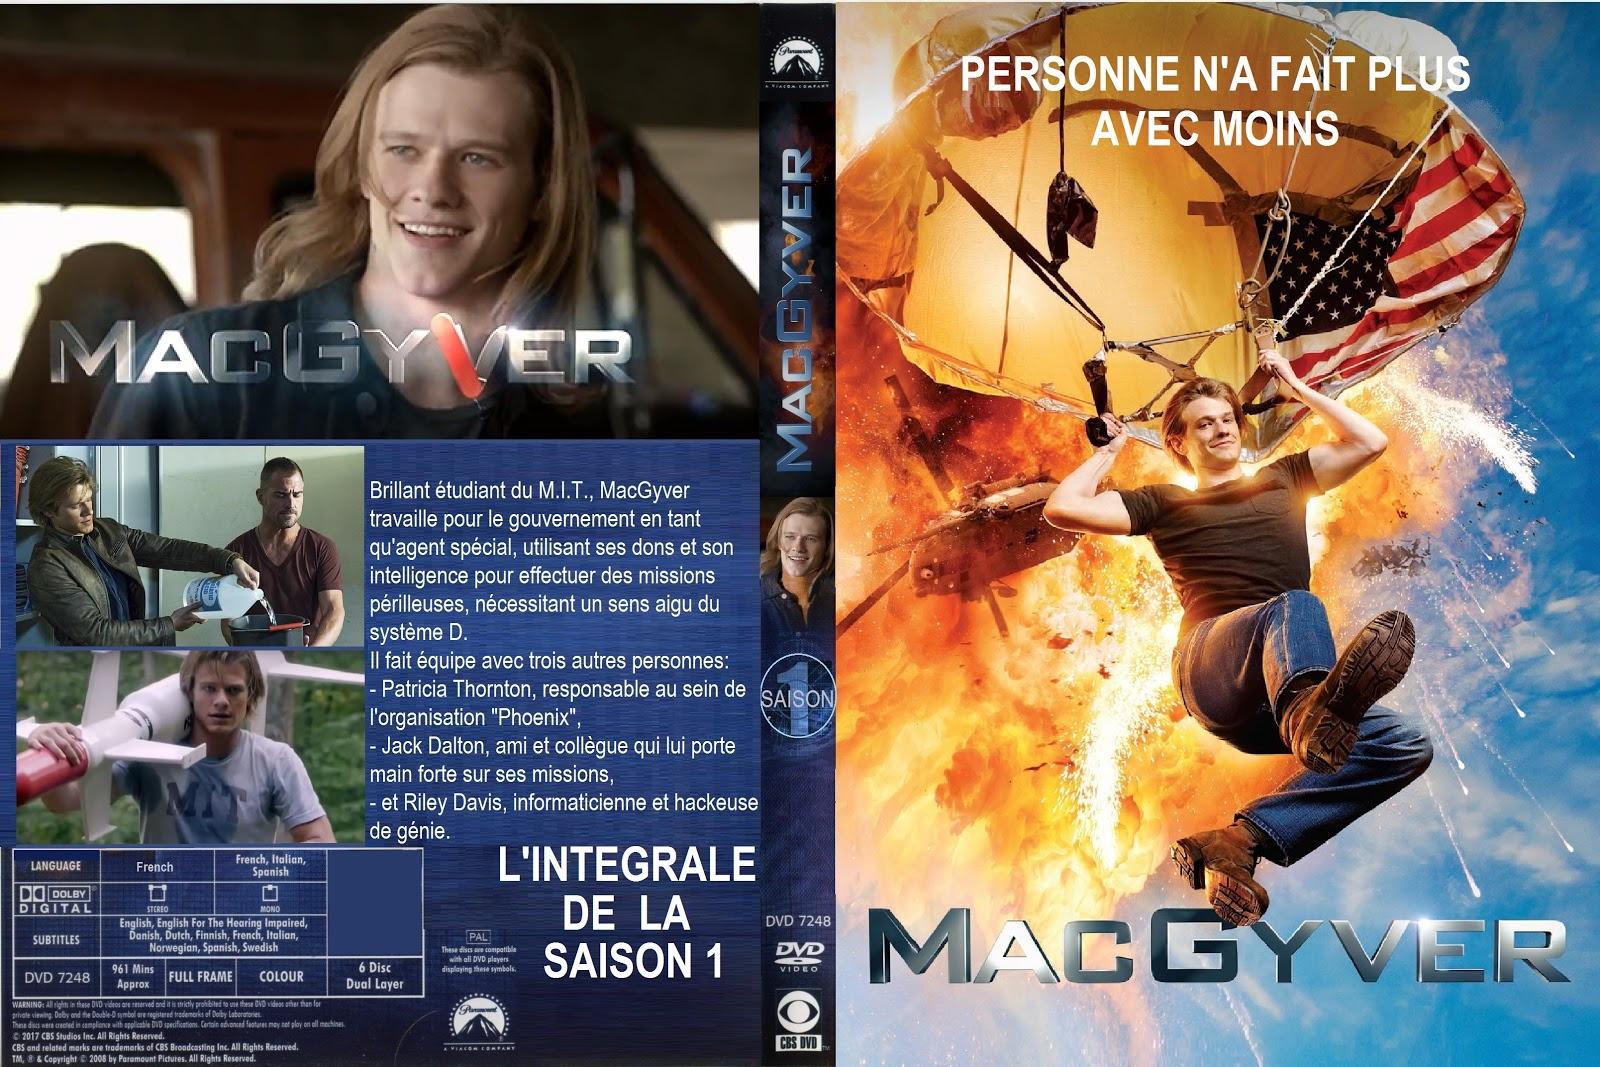 Macgyver Upskirt Season One